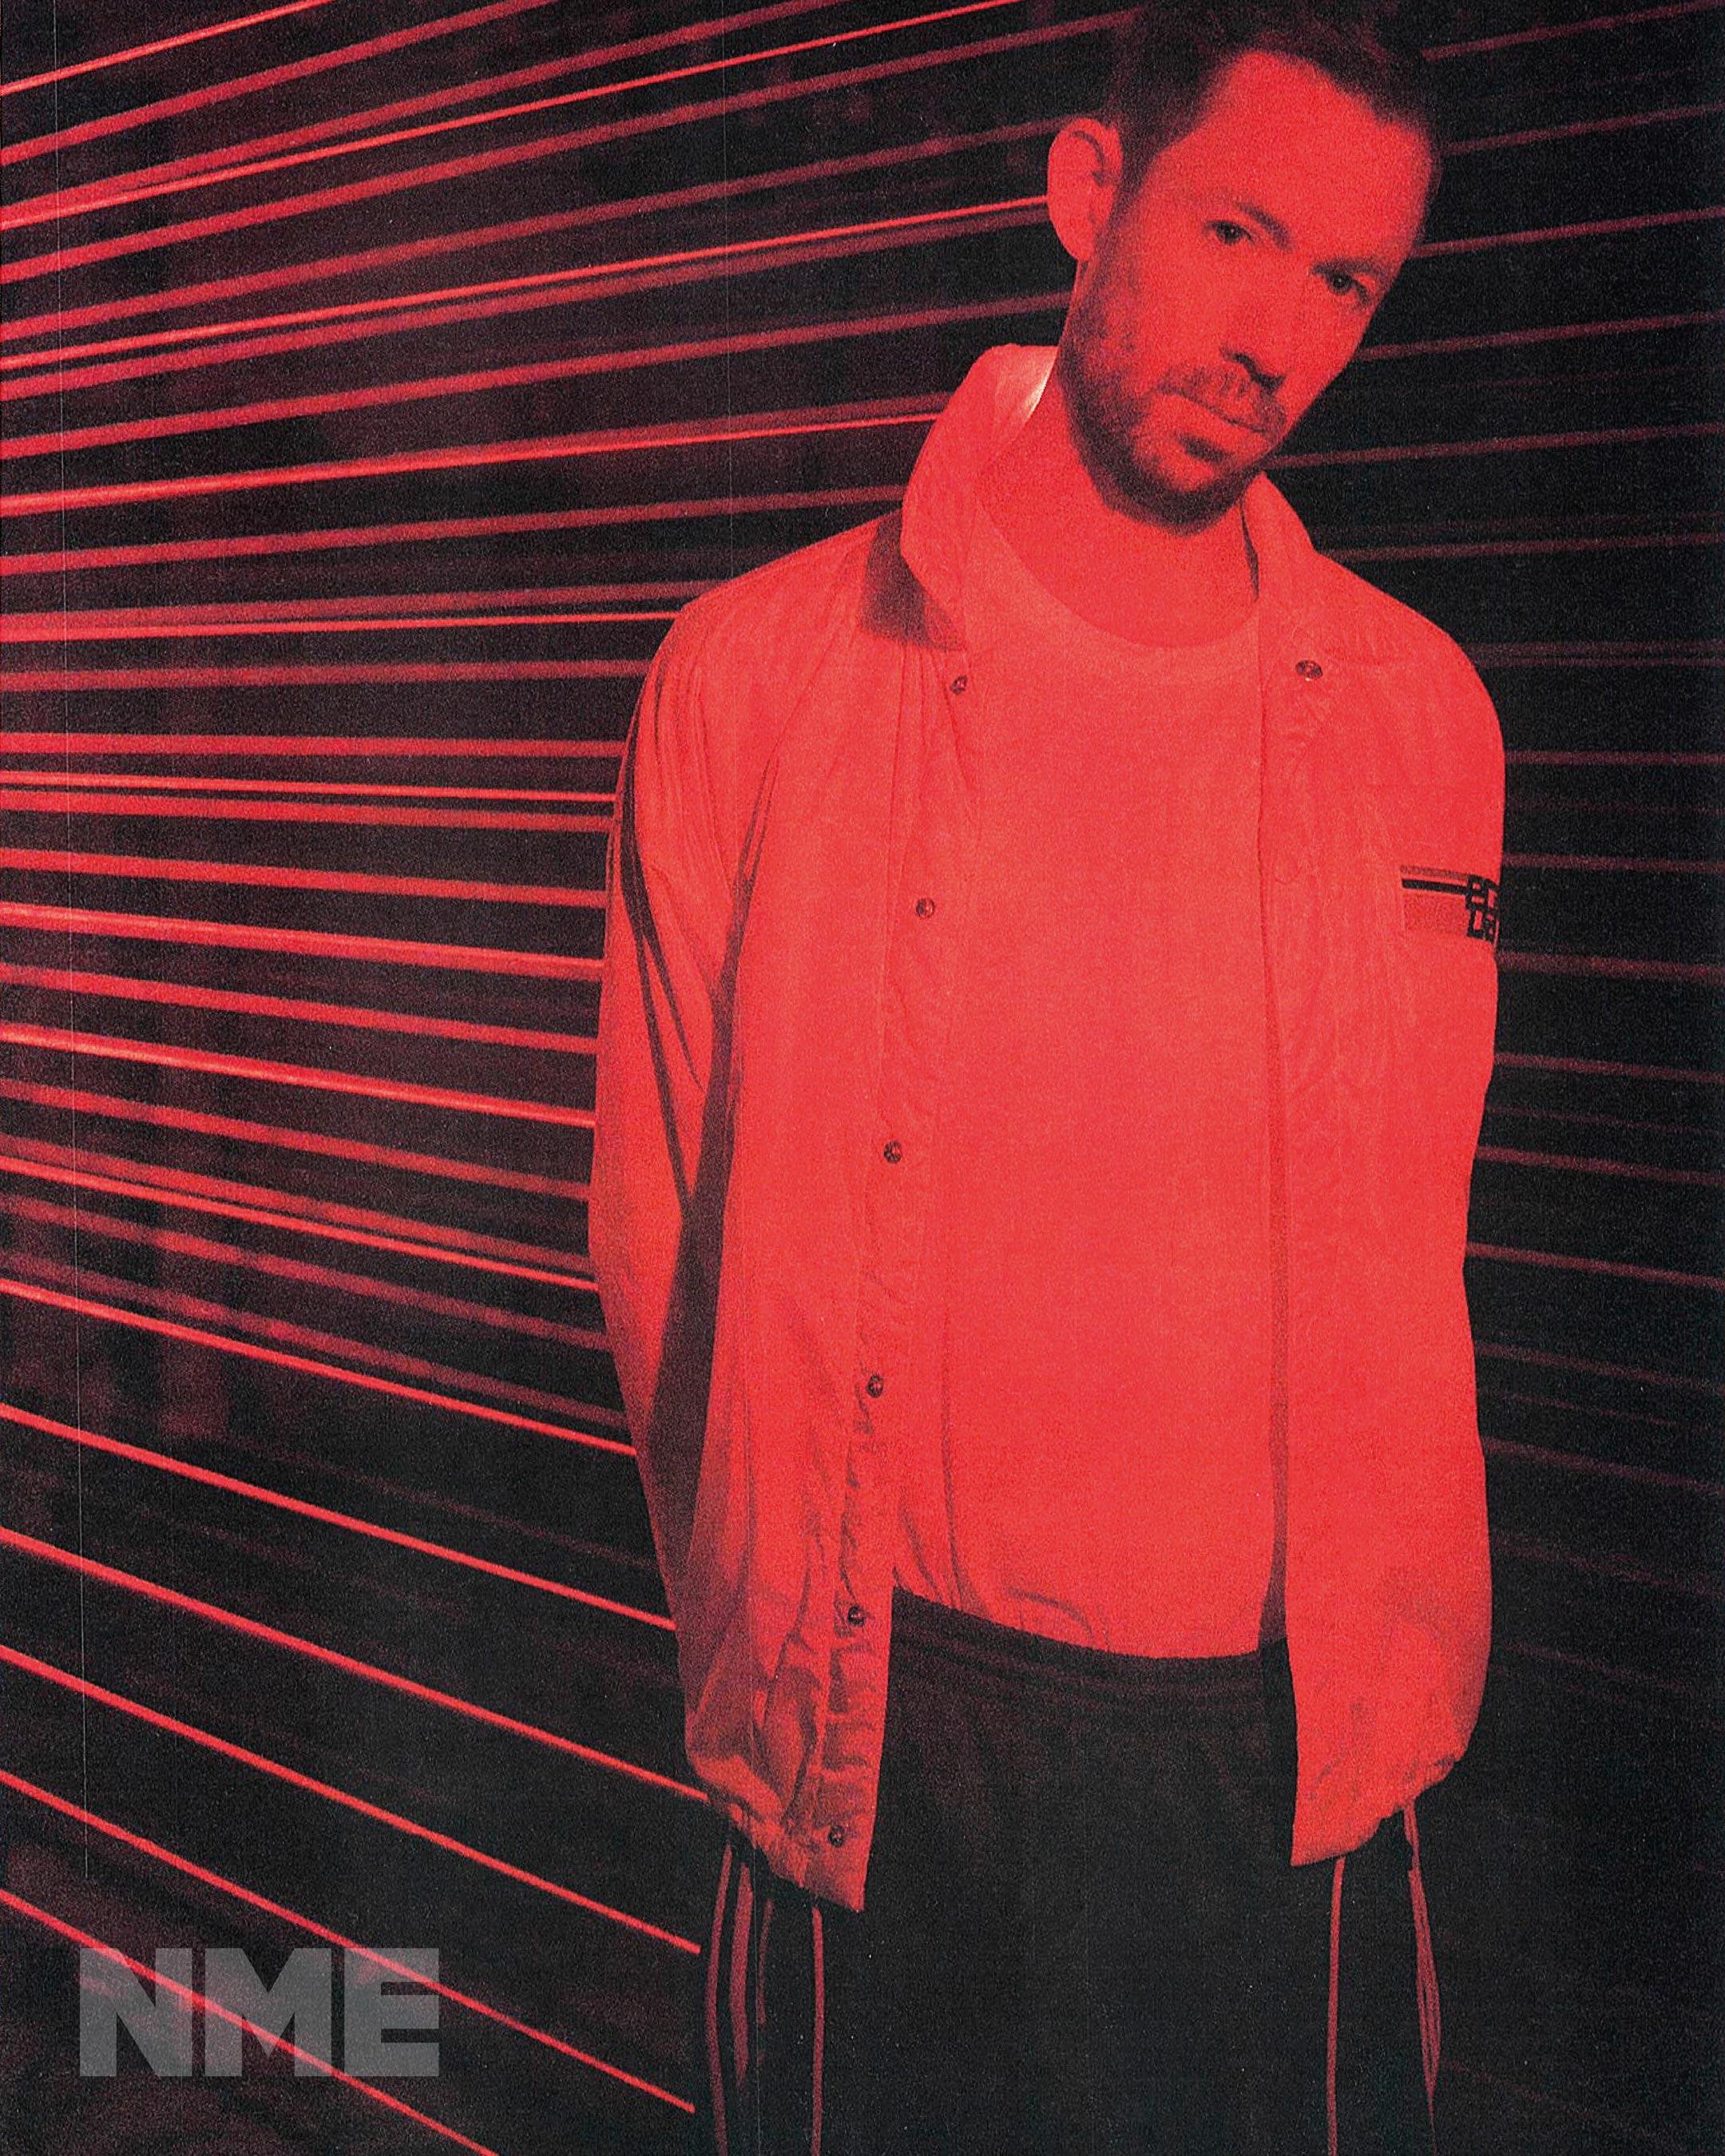 NME Cover AU 2021 Hiatus Kaiyote